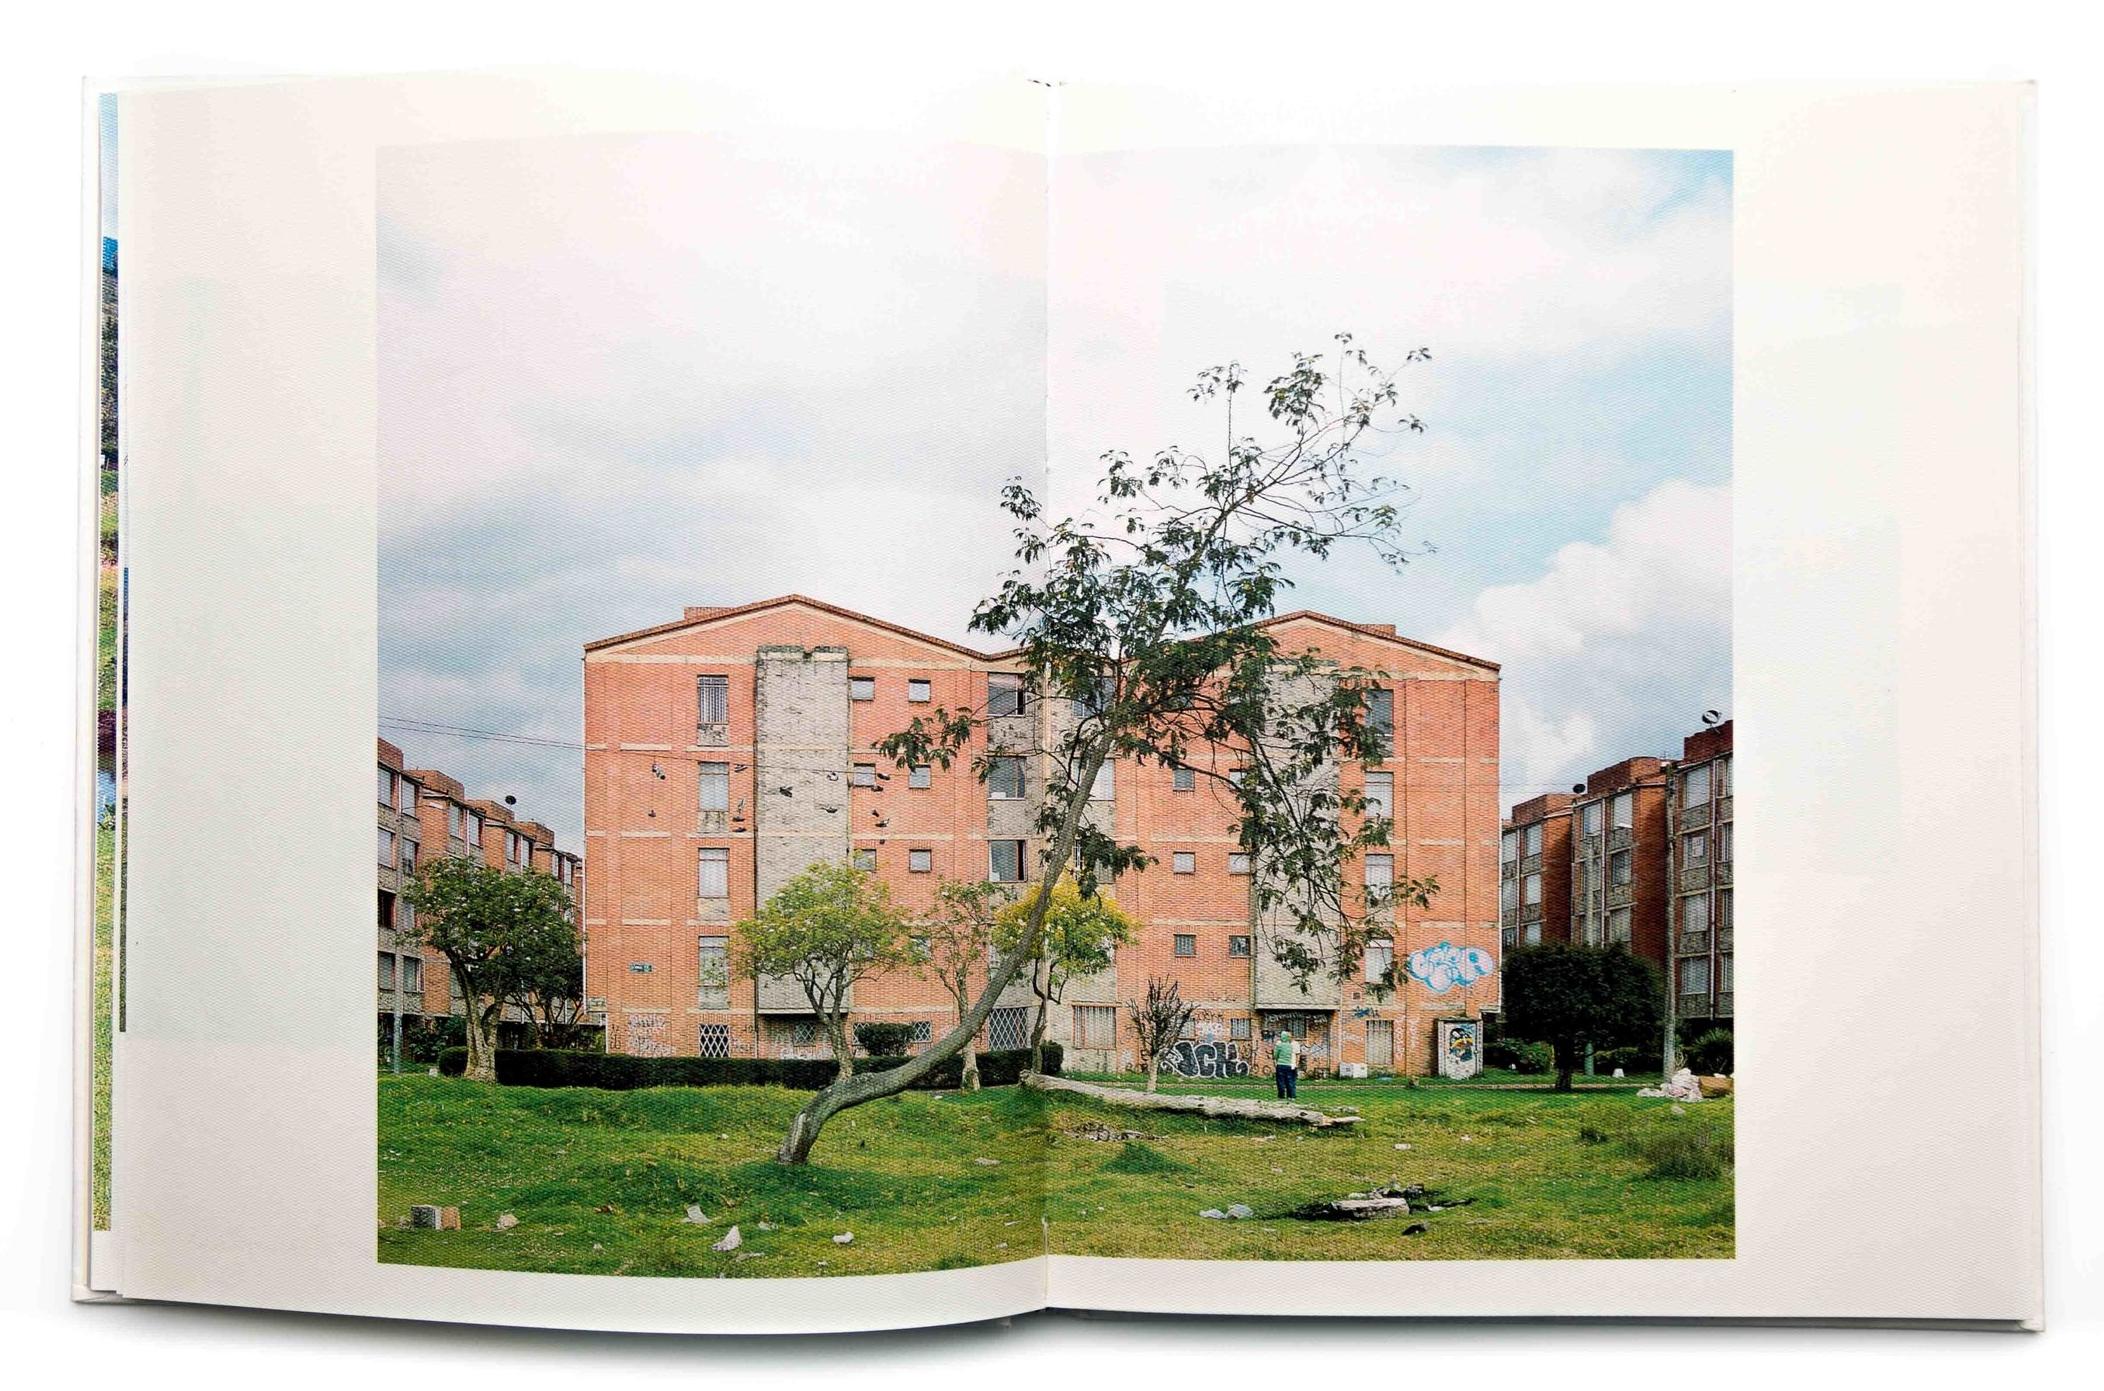 Fotolibro Colombiano - a place to live - Mateo Gomez García-201.jpg